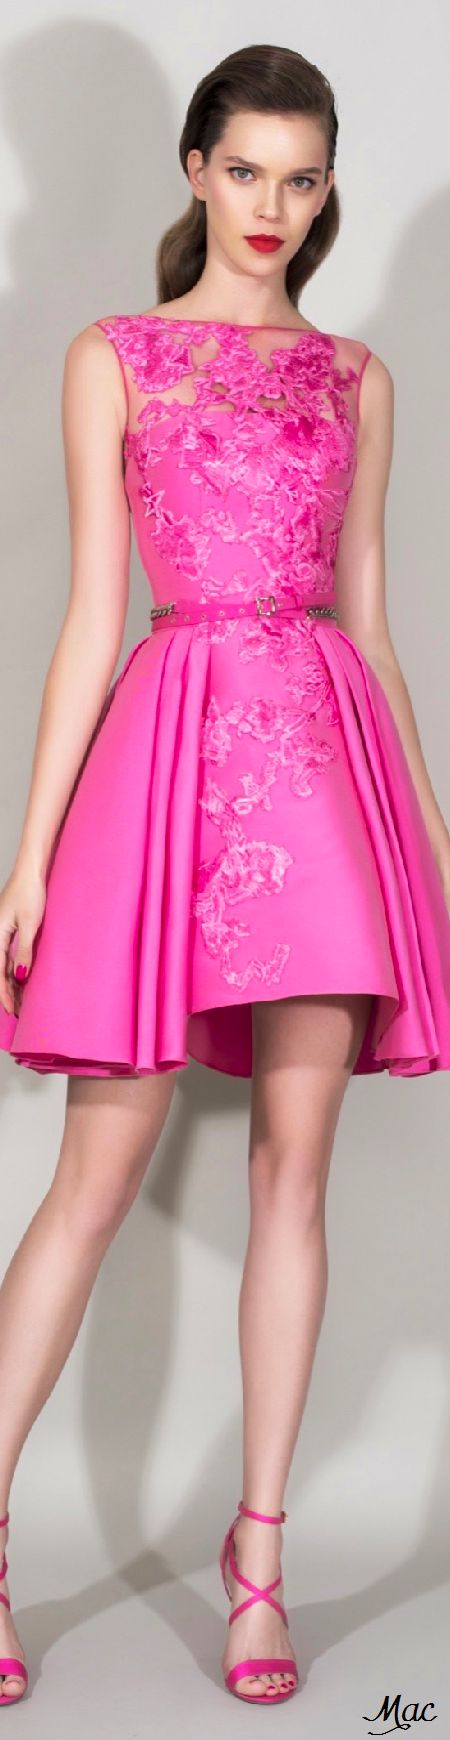 1319 best DRESSES images on Pinterest | Mini dresses, Short dresses ...